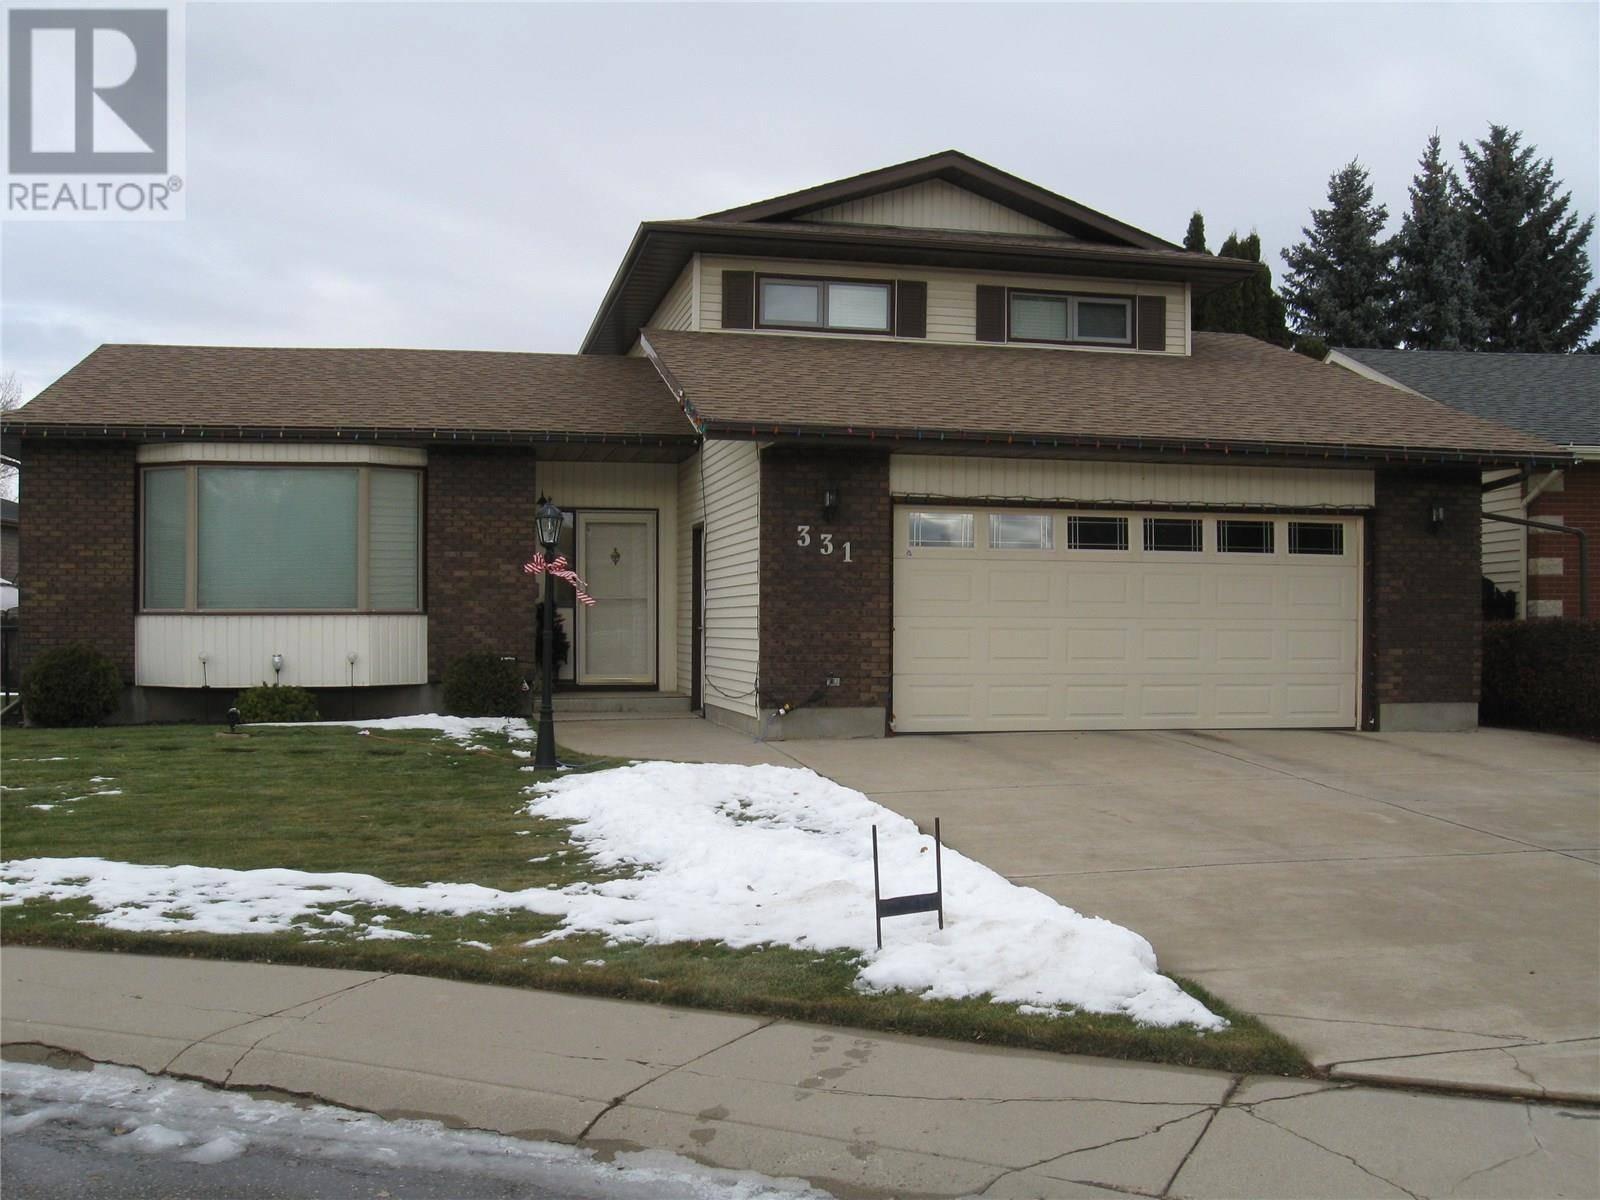 House for sale at 331 Peberdy Ter  Saskatoon Saskatchewan - MLS: SK784788